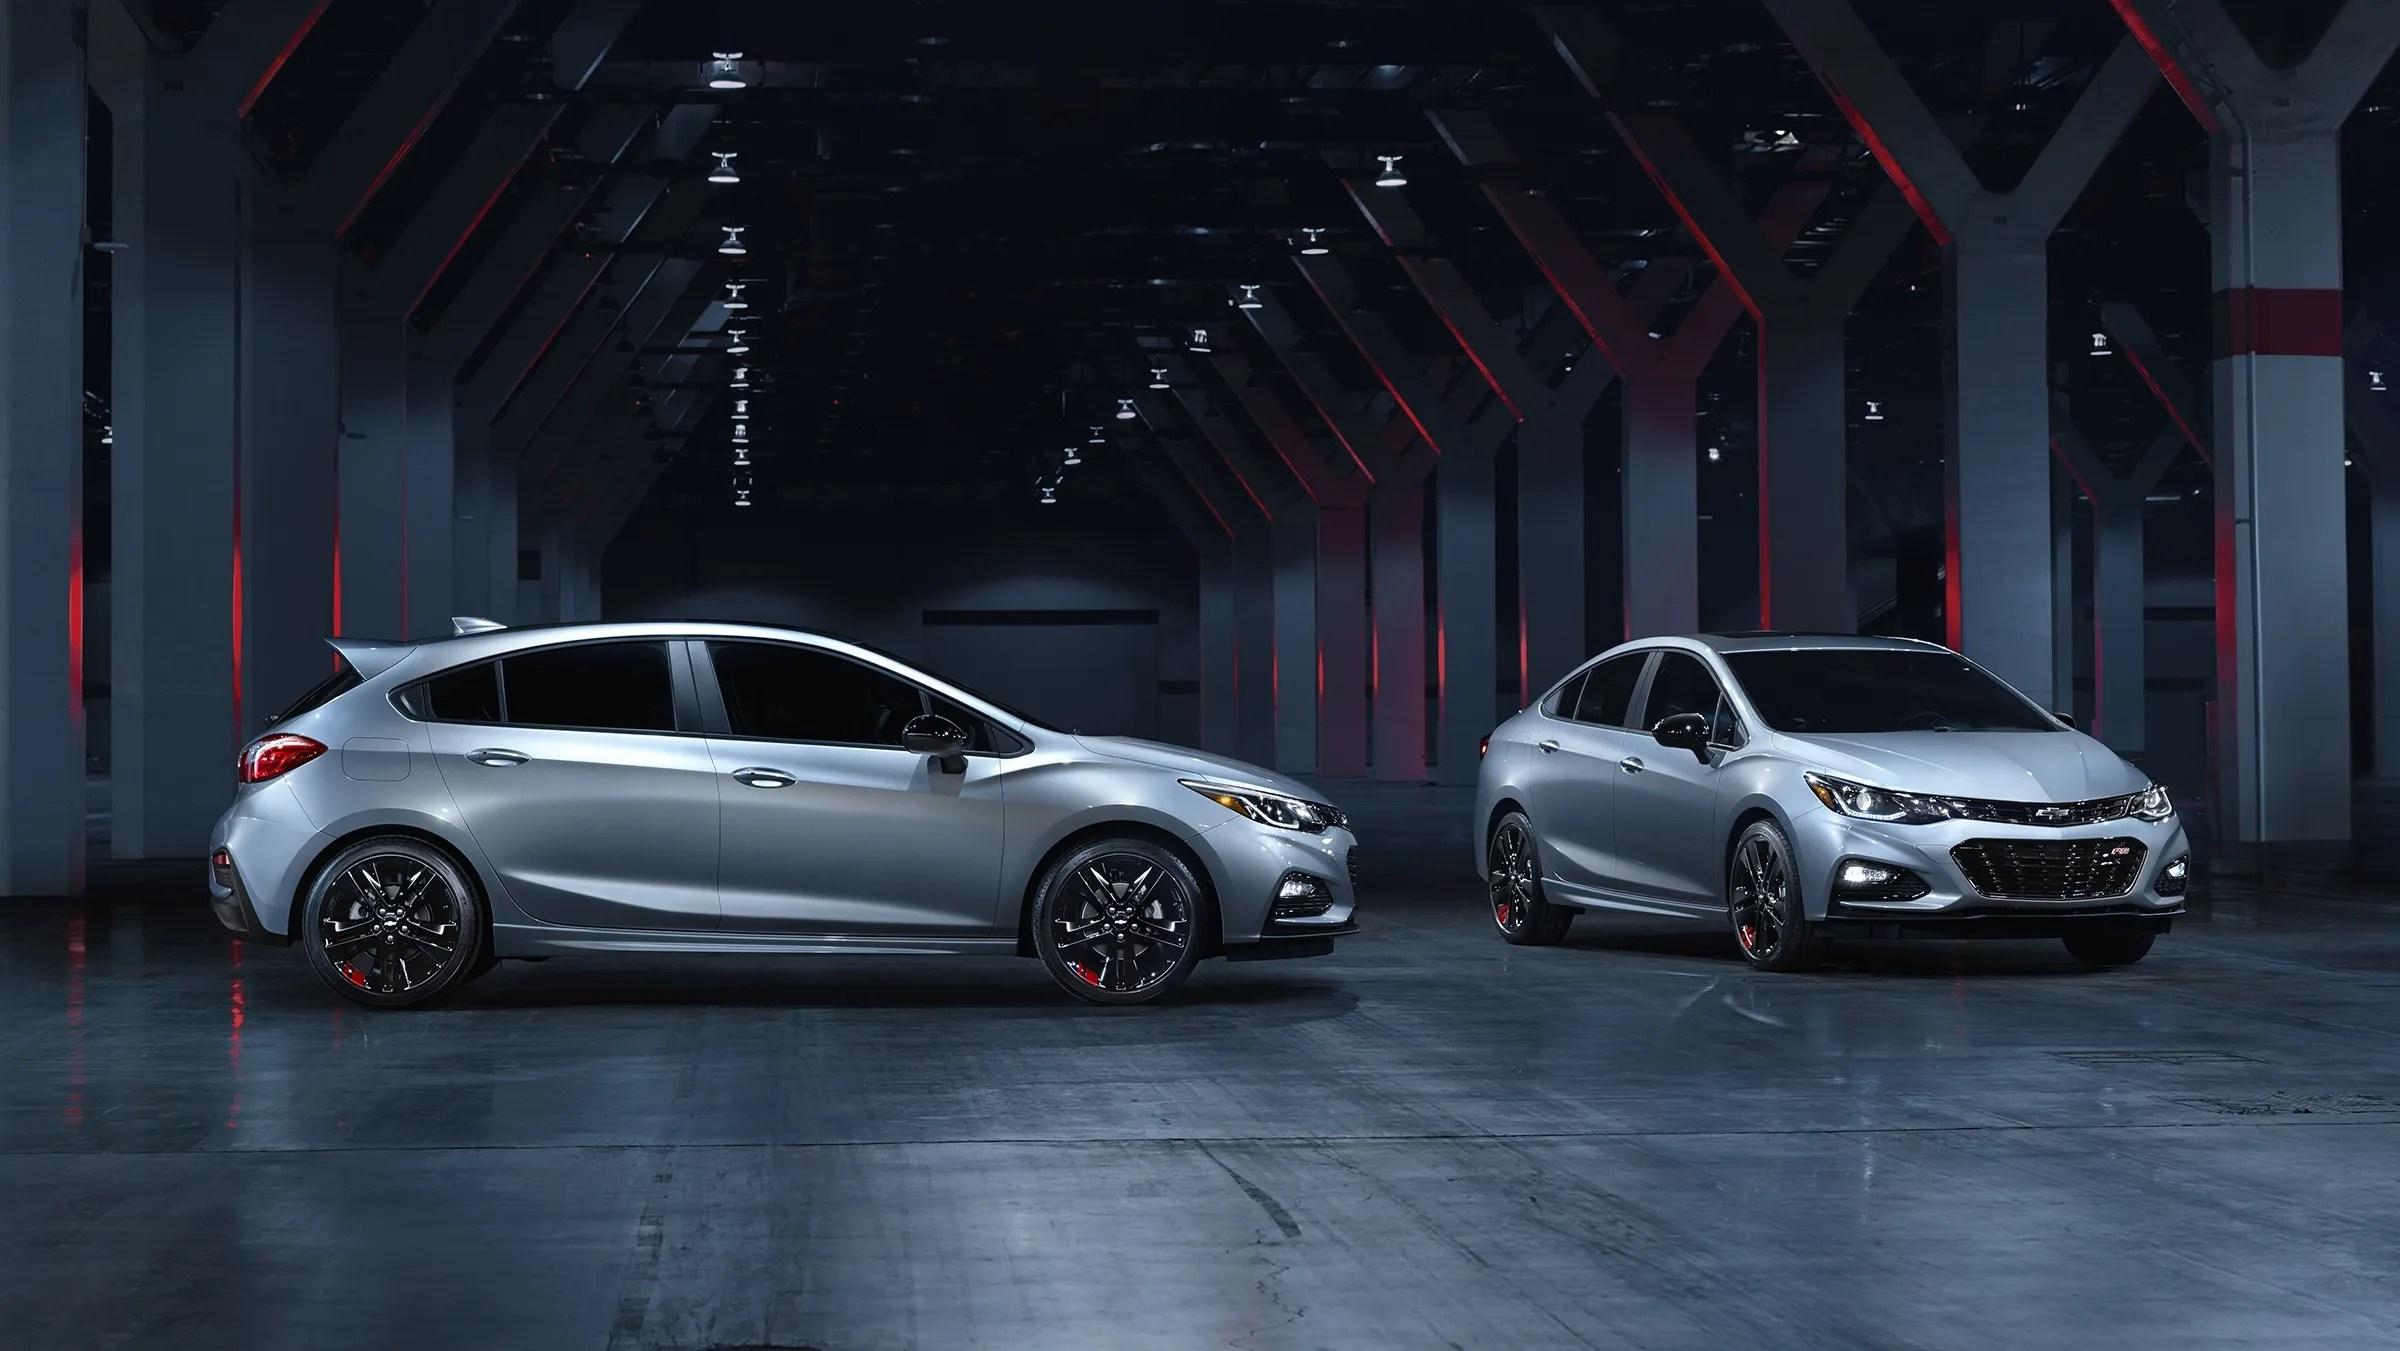 Honda City Car Hd Wallpaper Download 2017 Chevrolet Cruze Redline Edition Pictures Photos